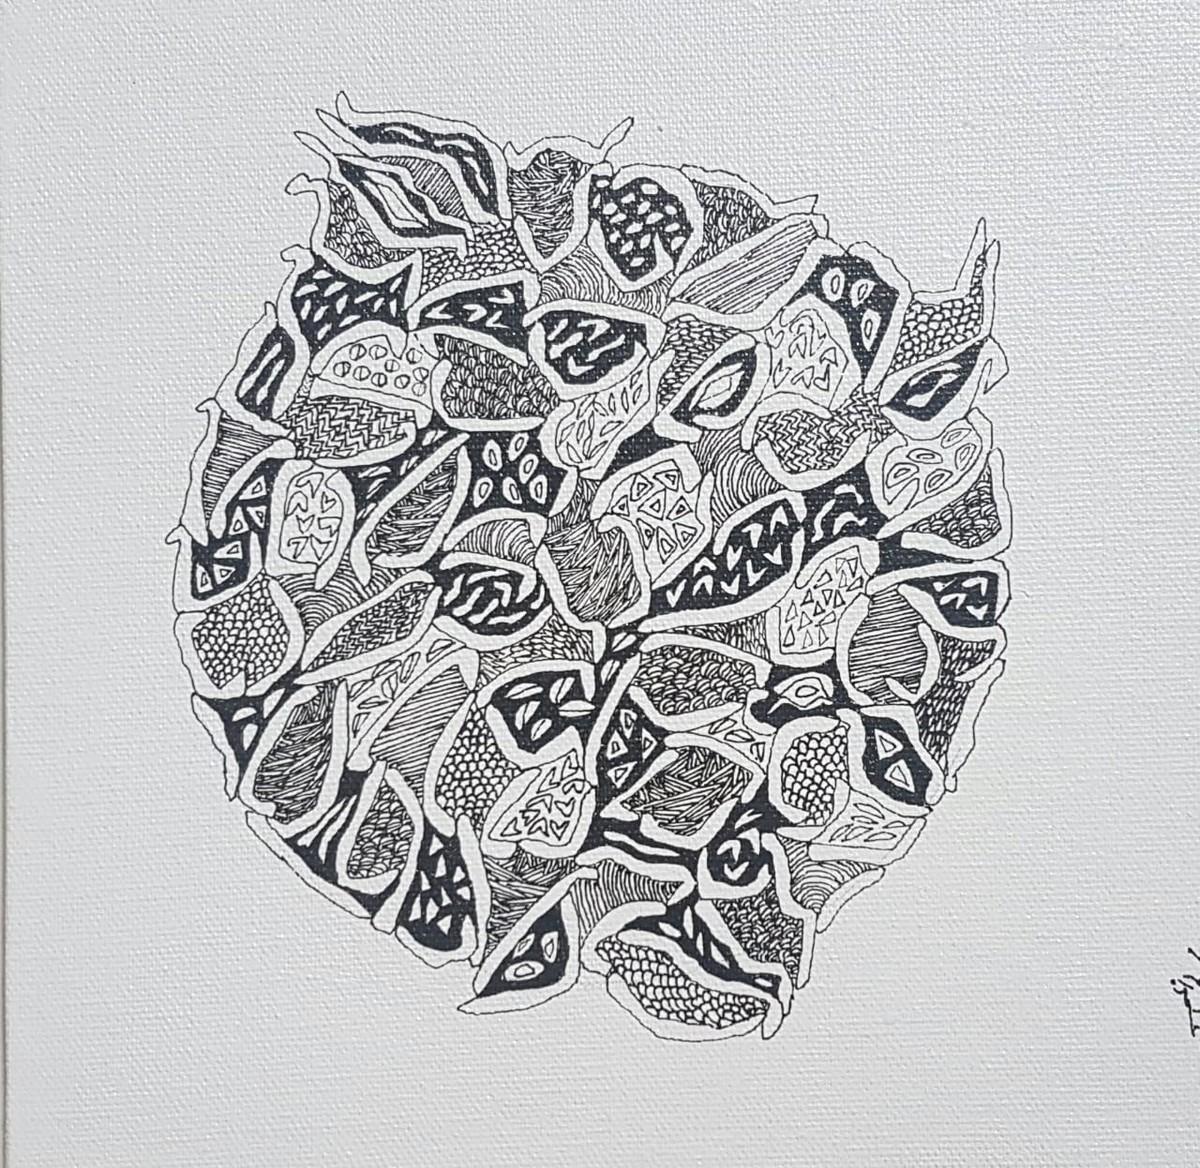 Landscape by Ramakrishna Vasanthula, Illustration Drawing, Pen on Canvas, Gray color